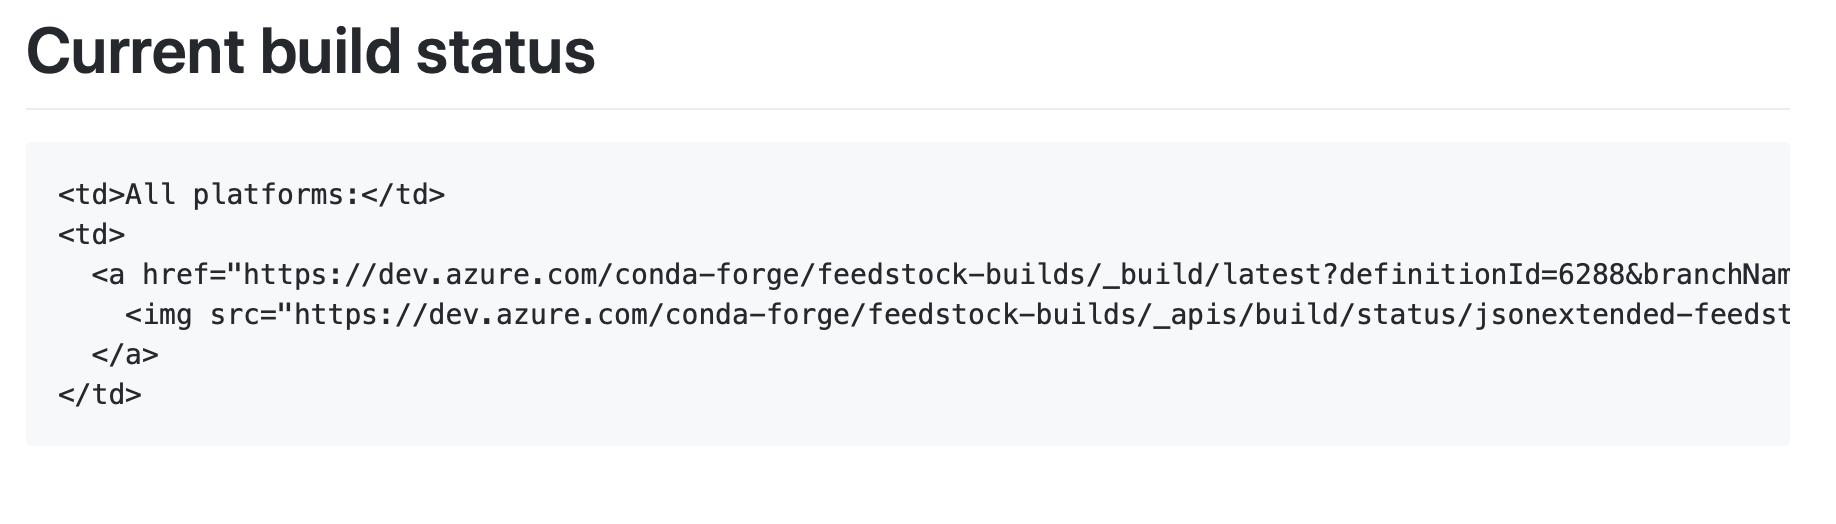 conda-forge - Bountysource